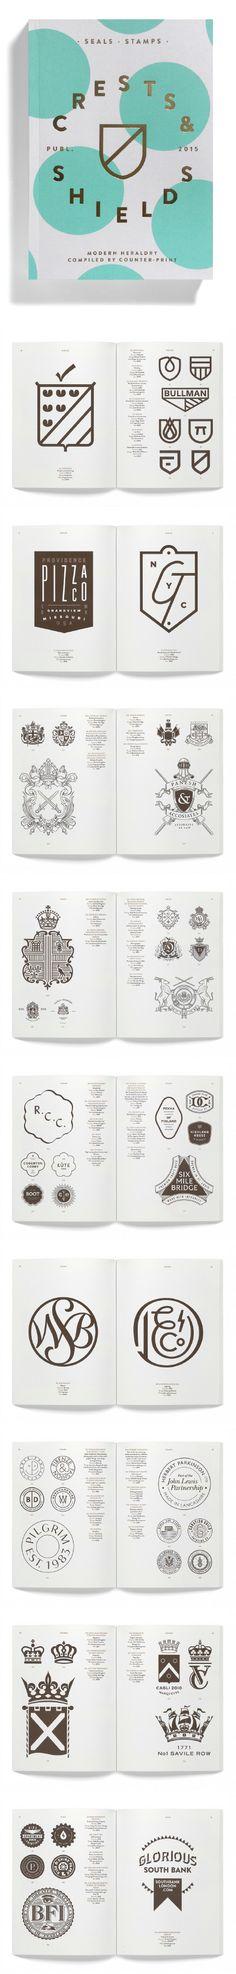 Modern Heraldry - Counter Print